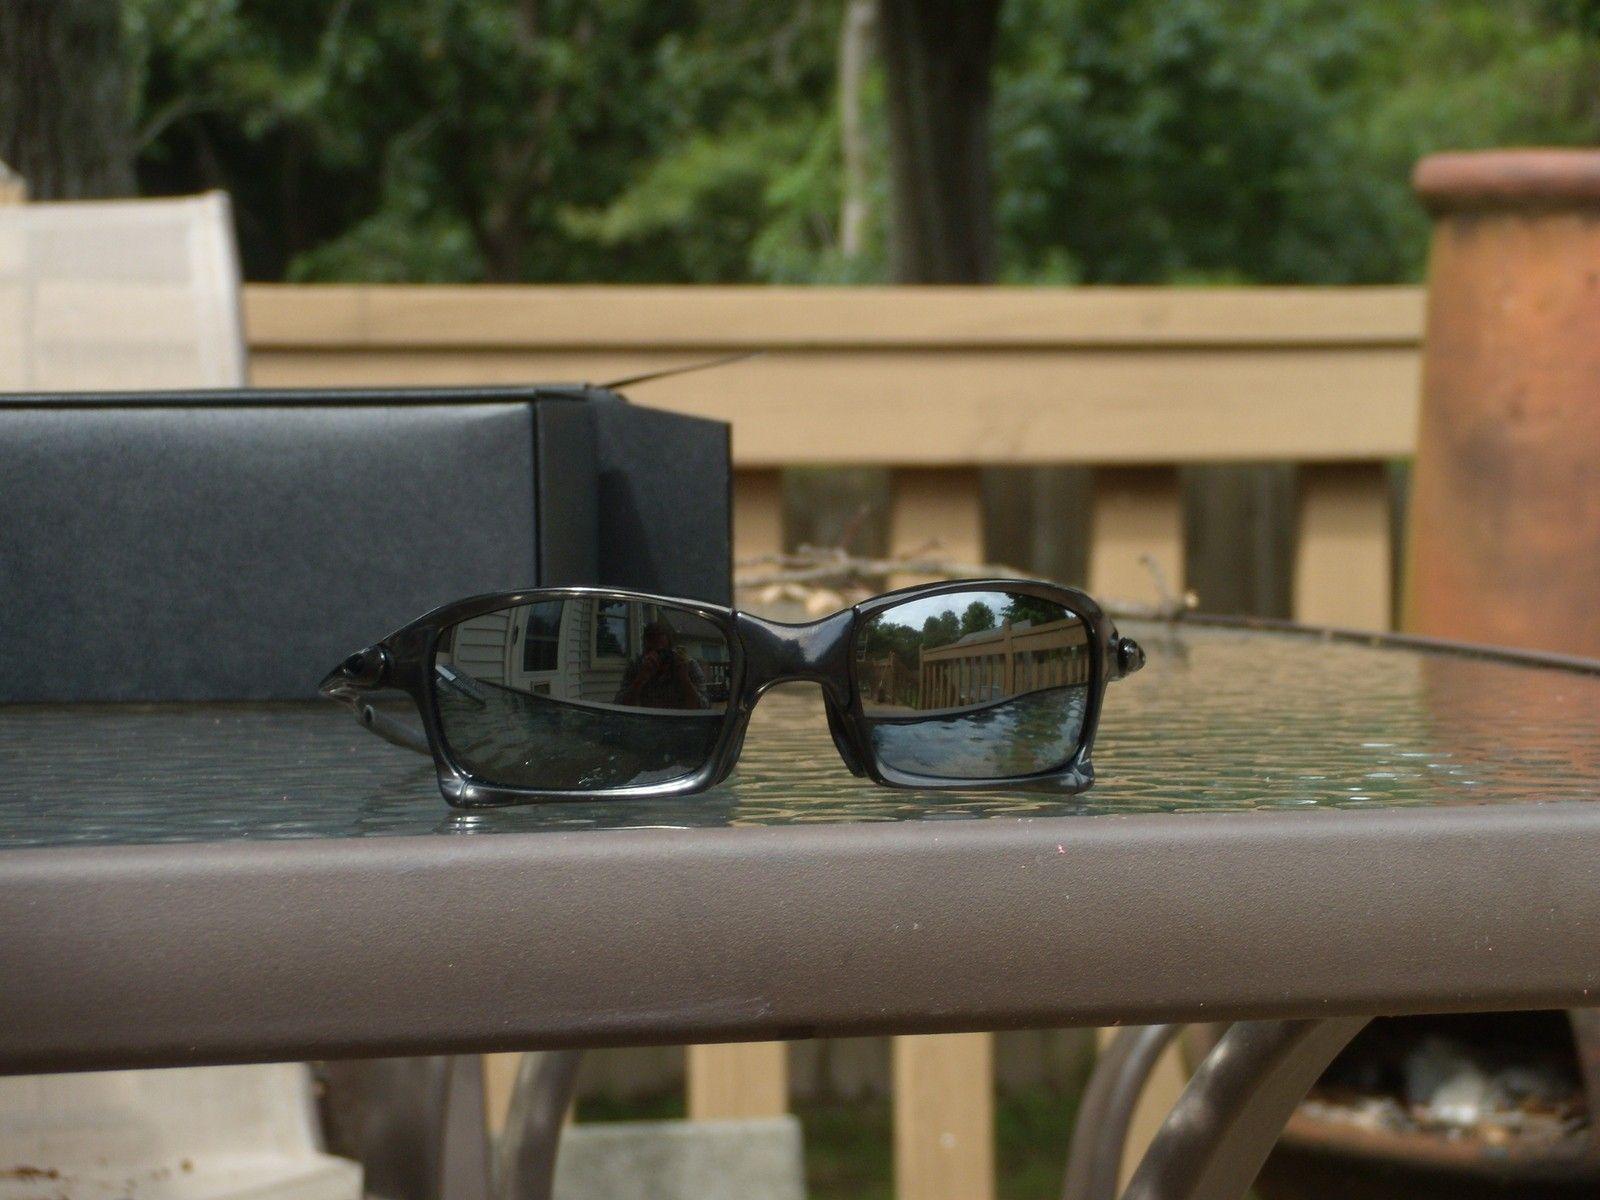 XX Squared Polished Carbon w/ Black Iridium Polarized lenses mint condition $450 obo - DSCN5992.JPG